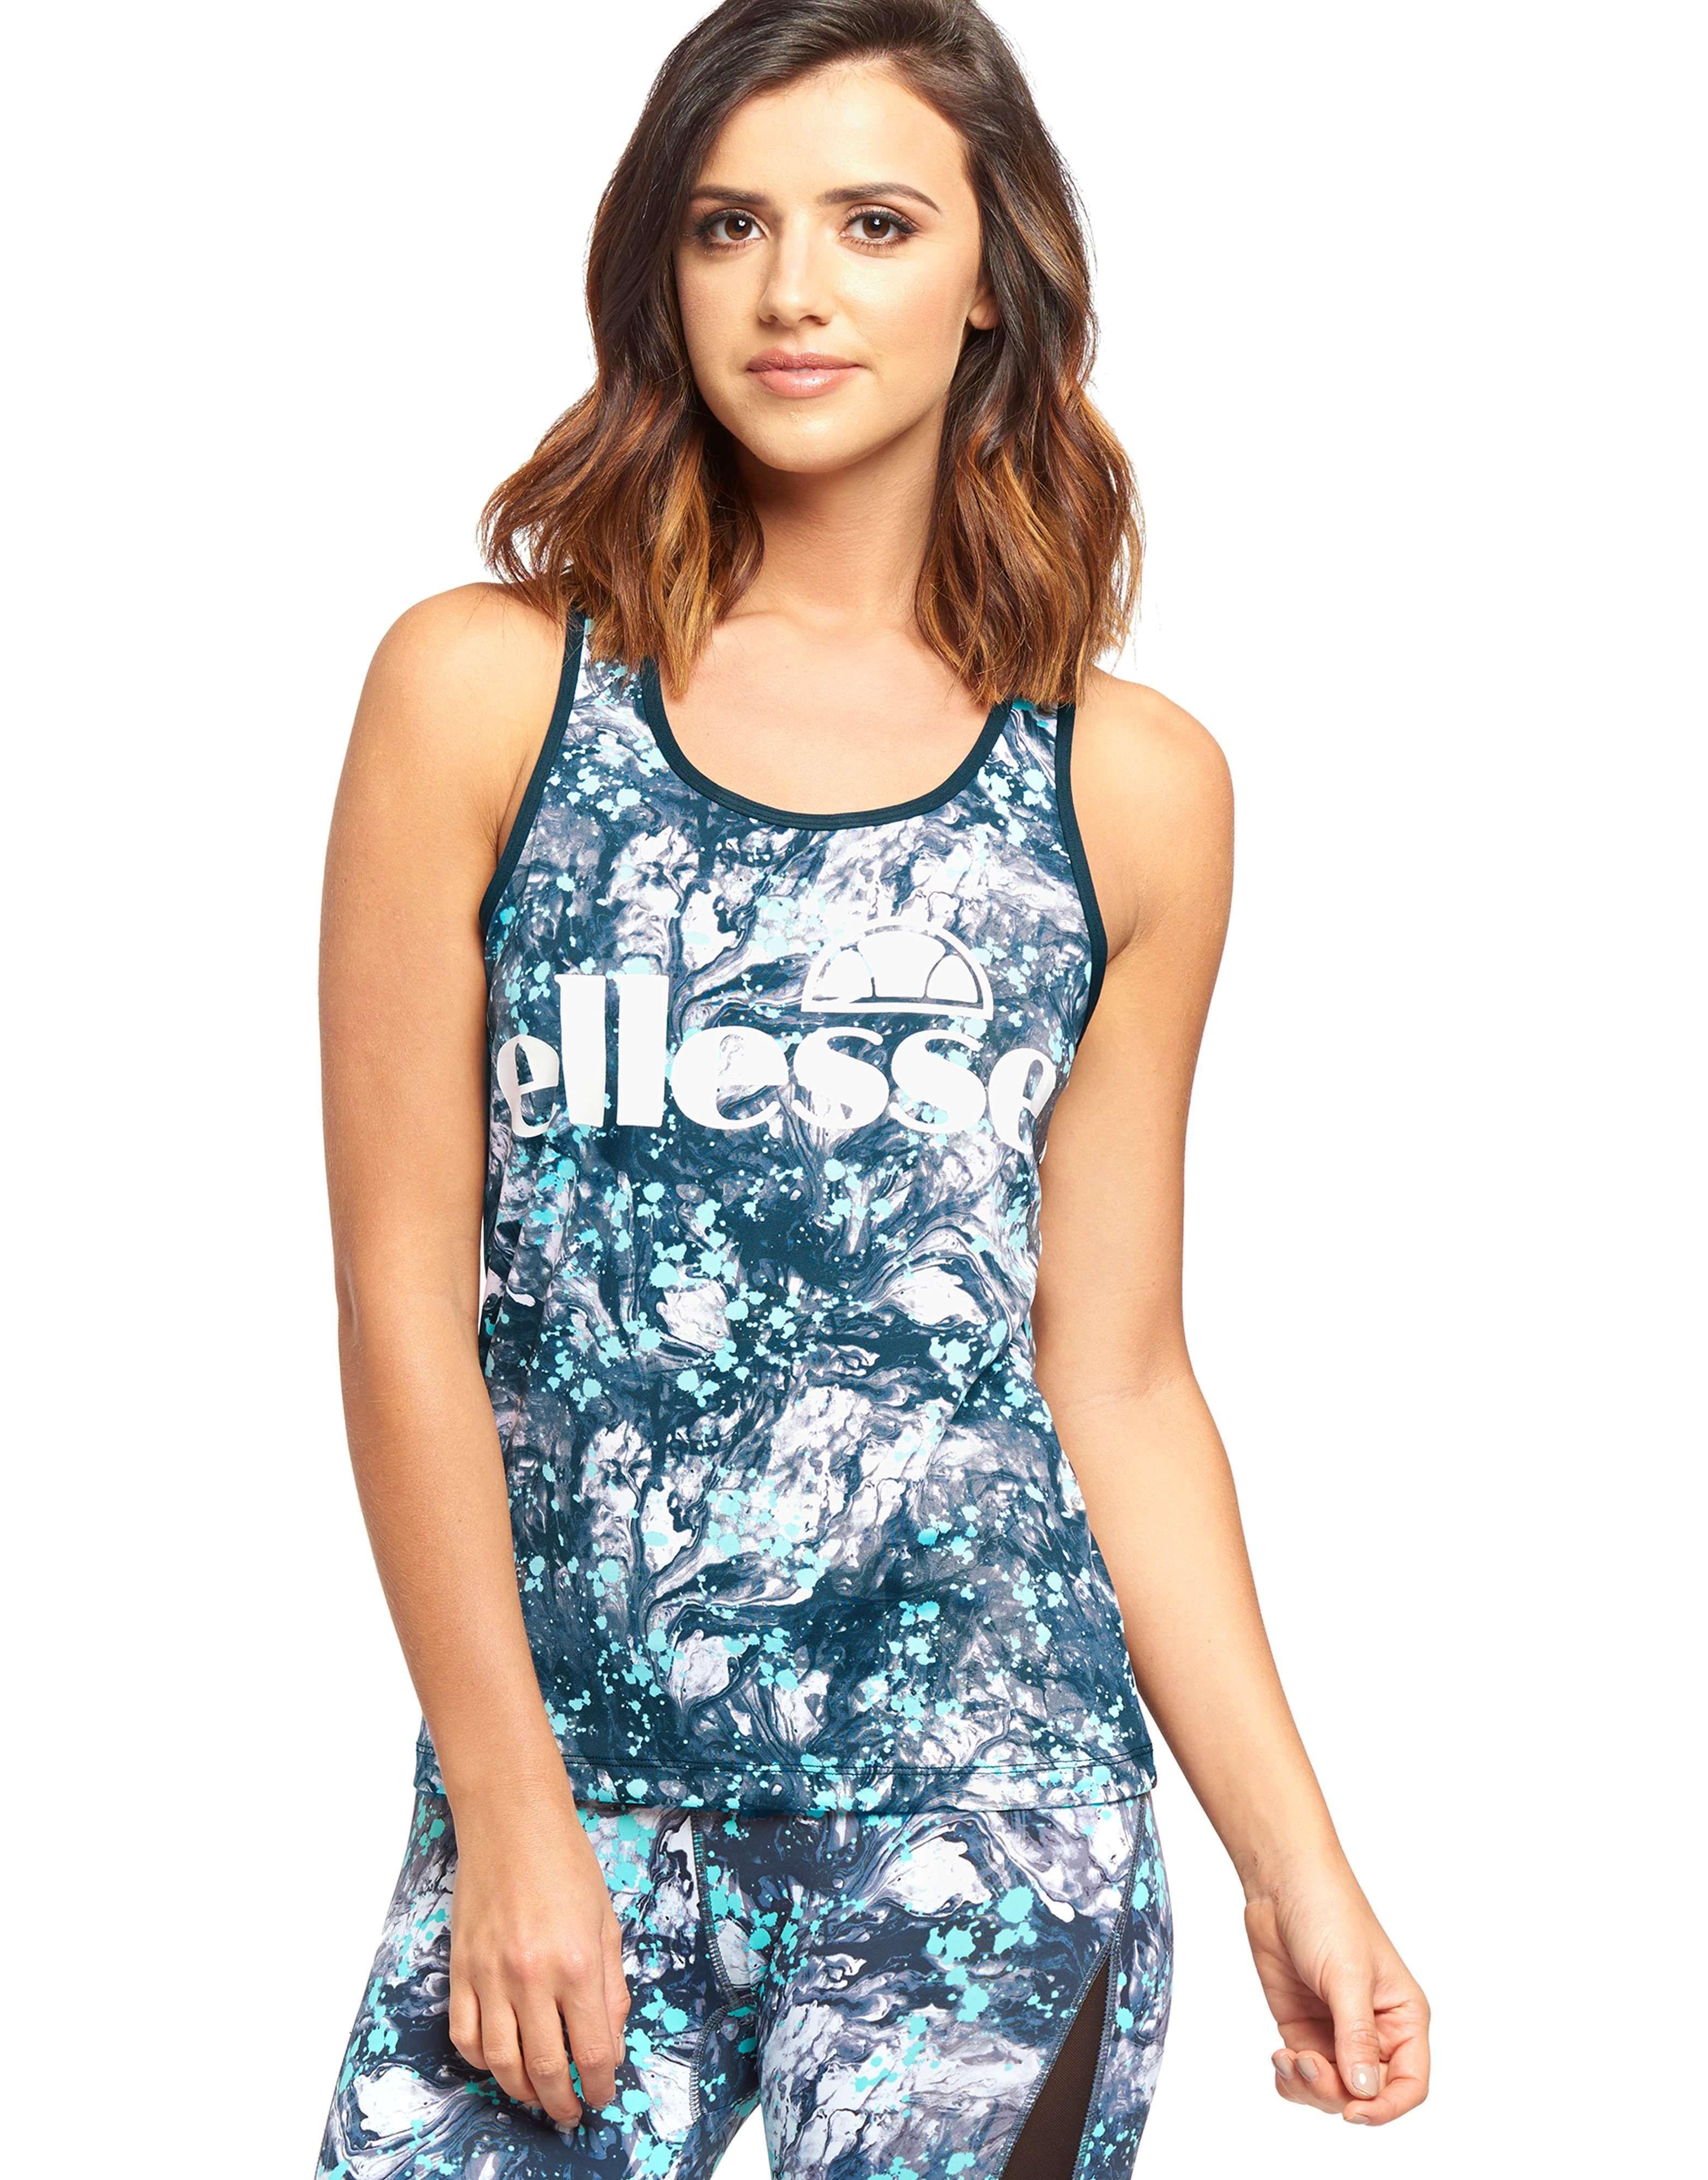 Ellesse Pecci Tank Top - Shop online for Ellesse Pecci Tank Top with JD  Sports,